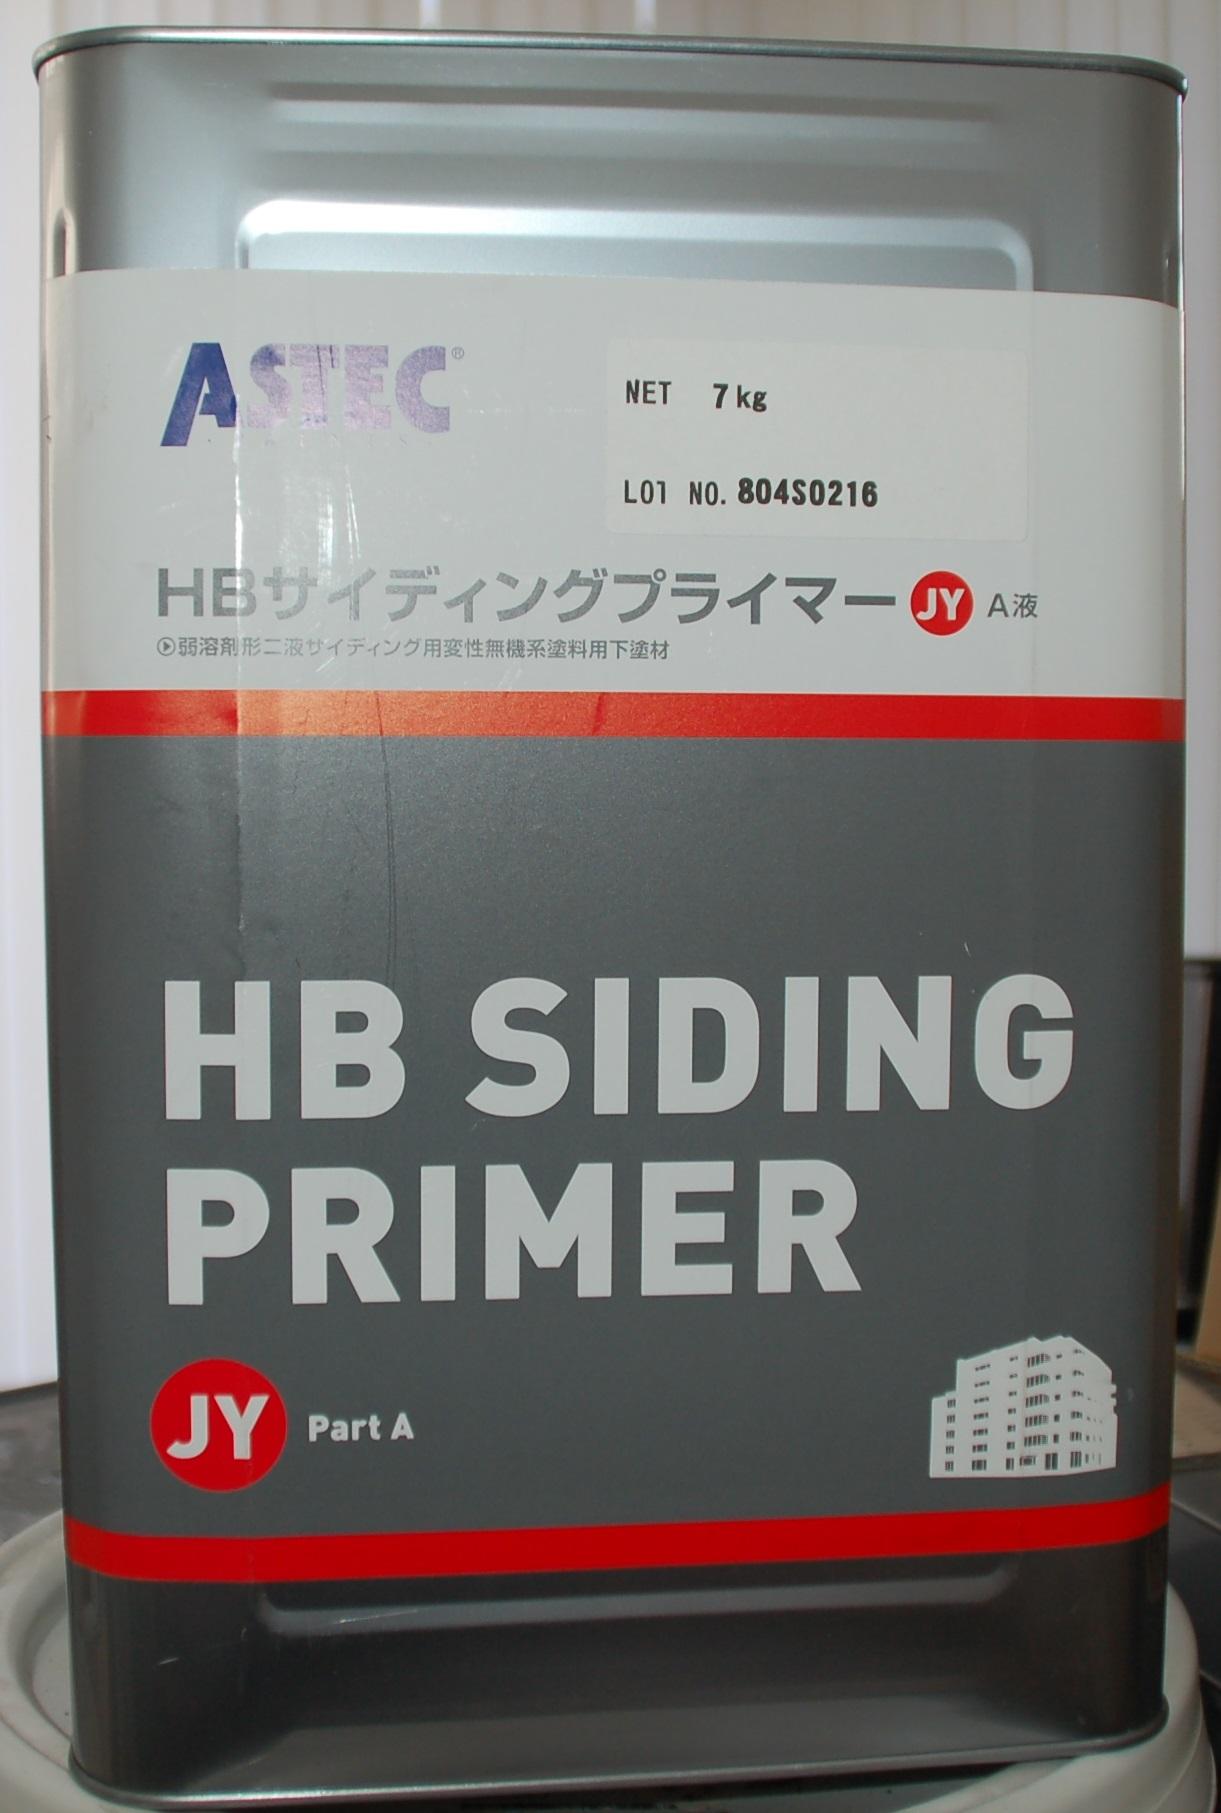 HBサイディングプライマーJY